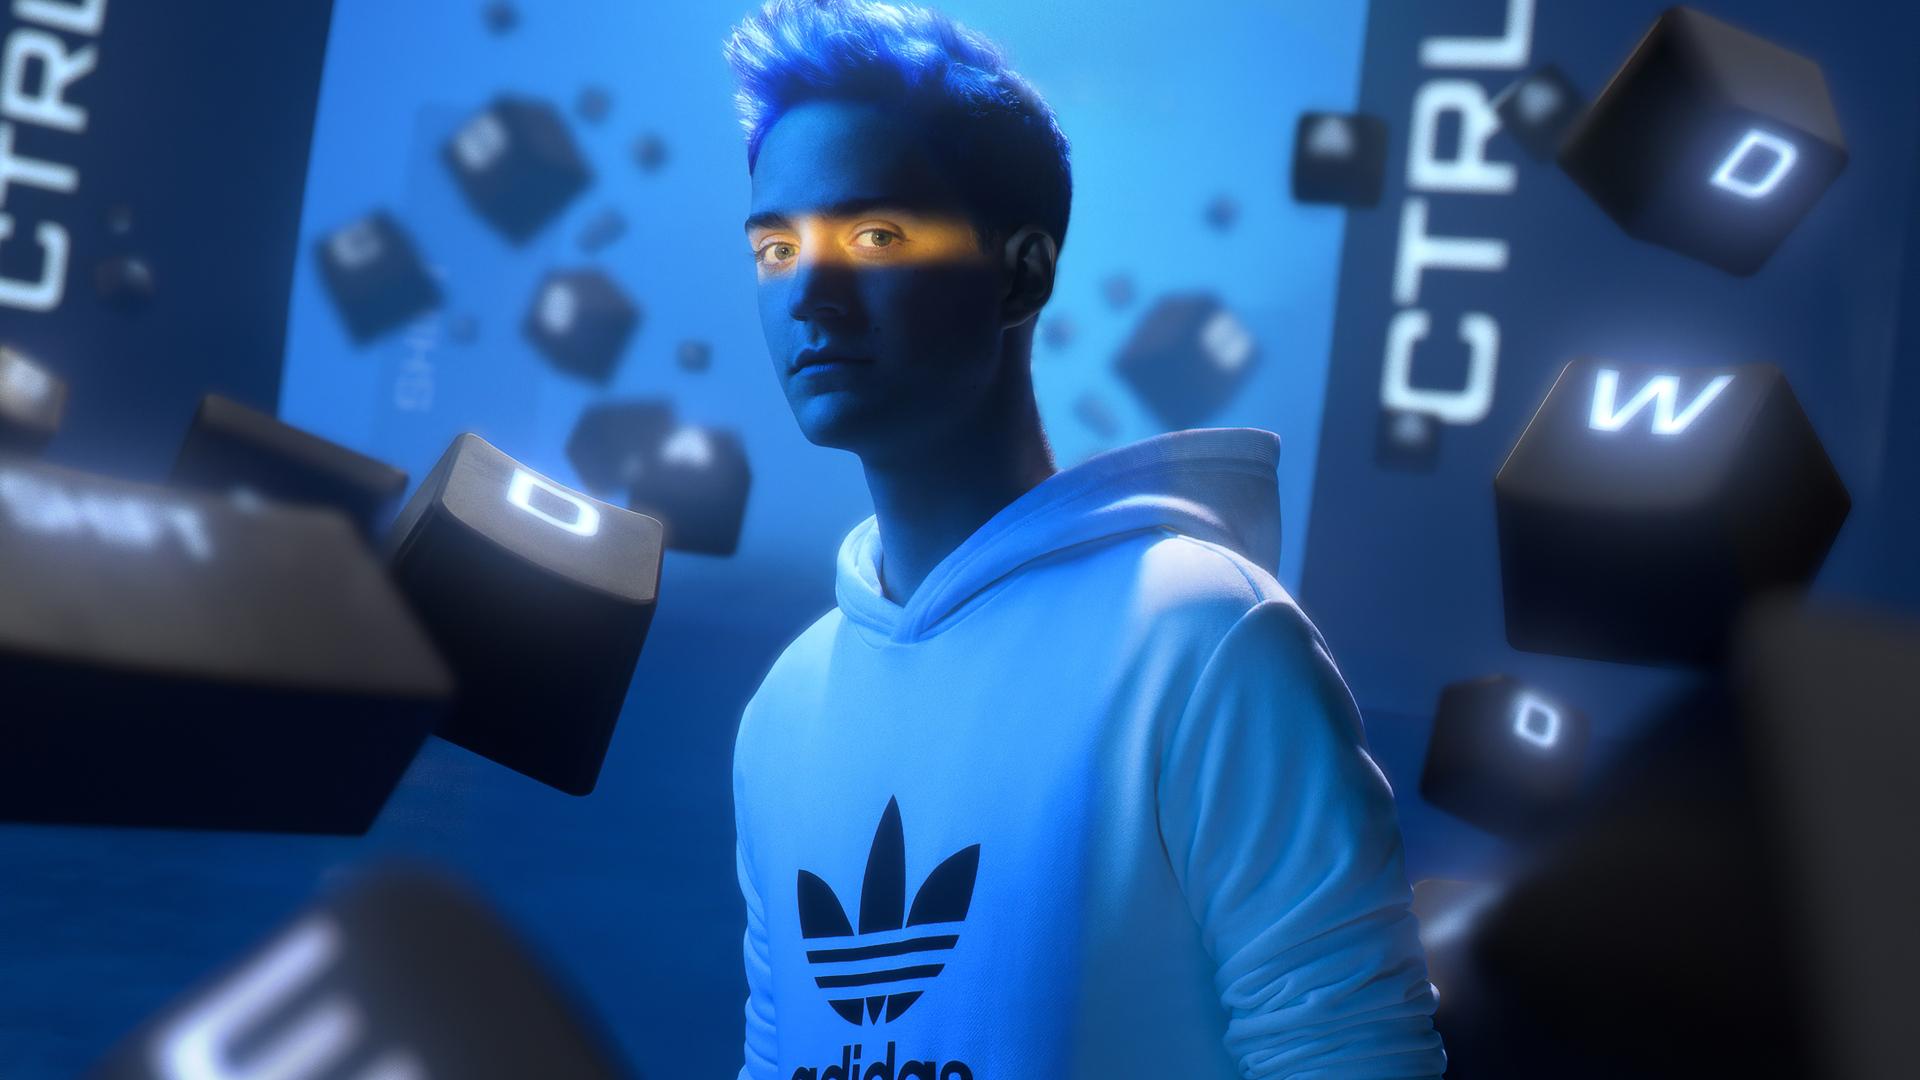 ninja-youtuber-4k-yx.jpg